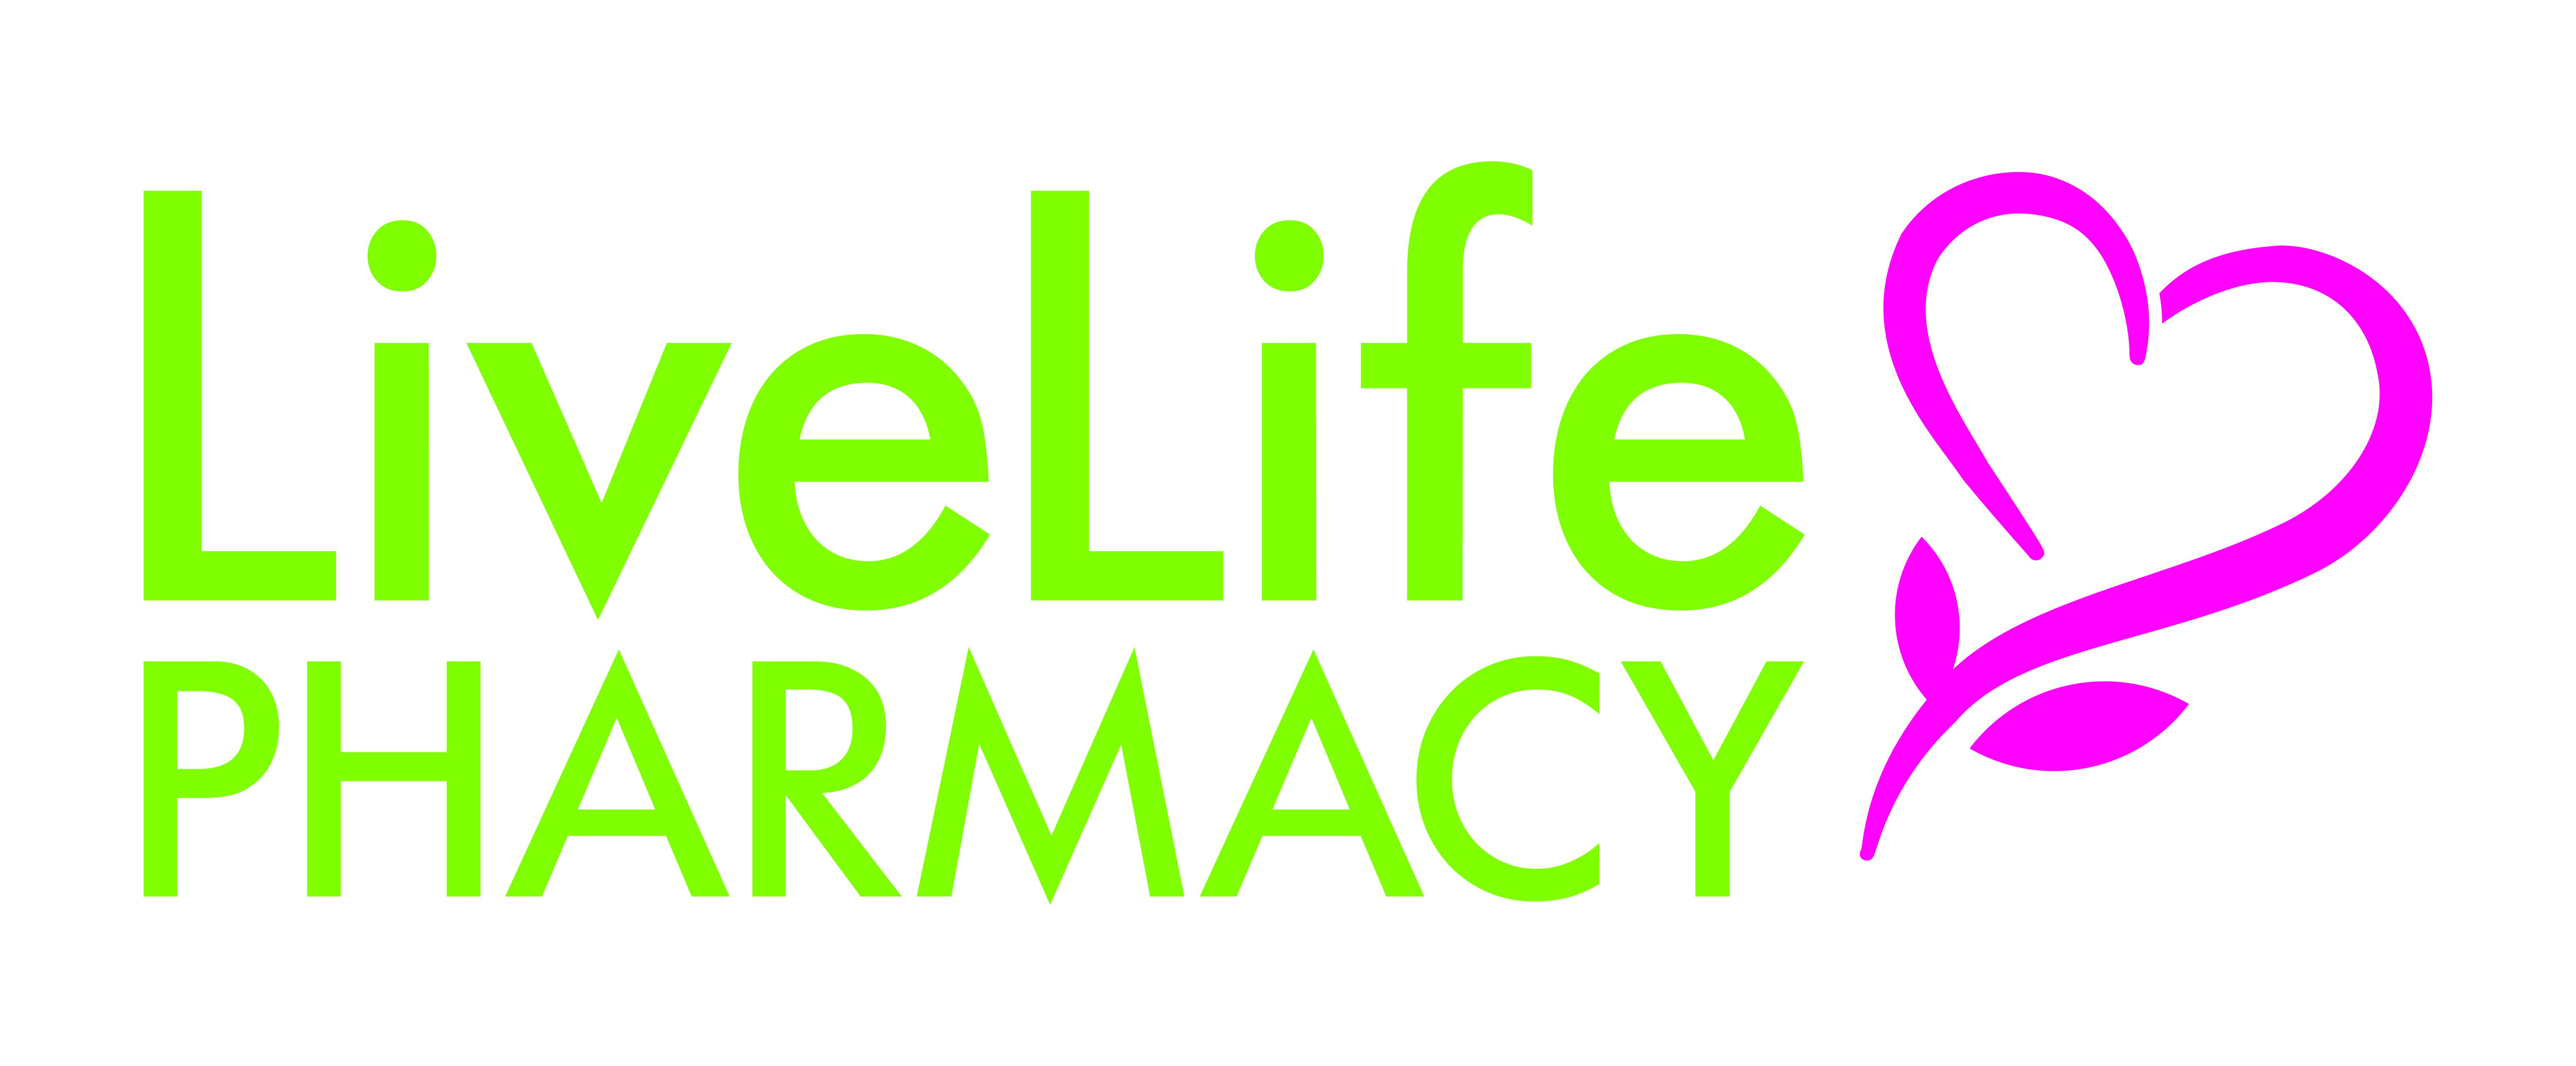 Livelife Pharmacy Goodchap Street